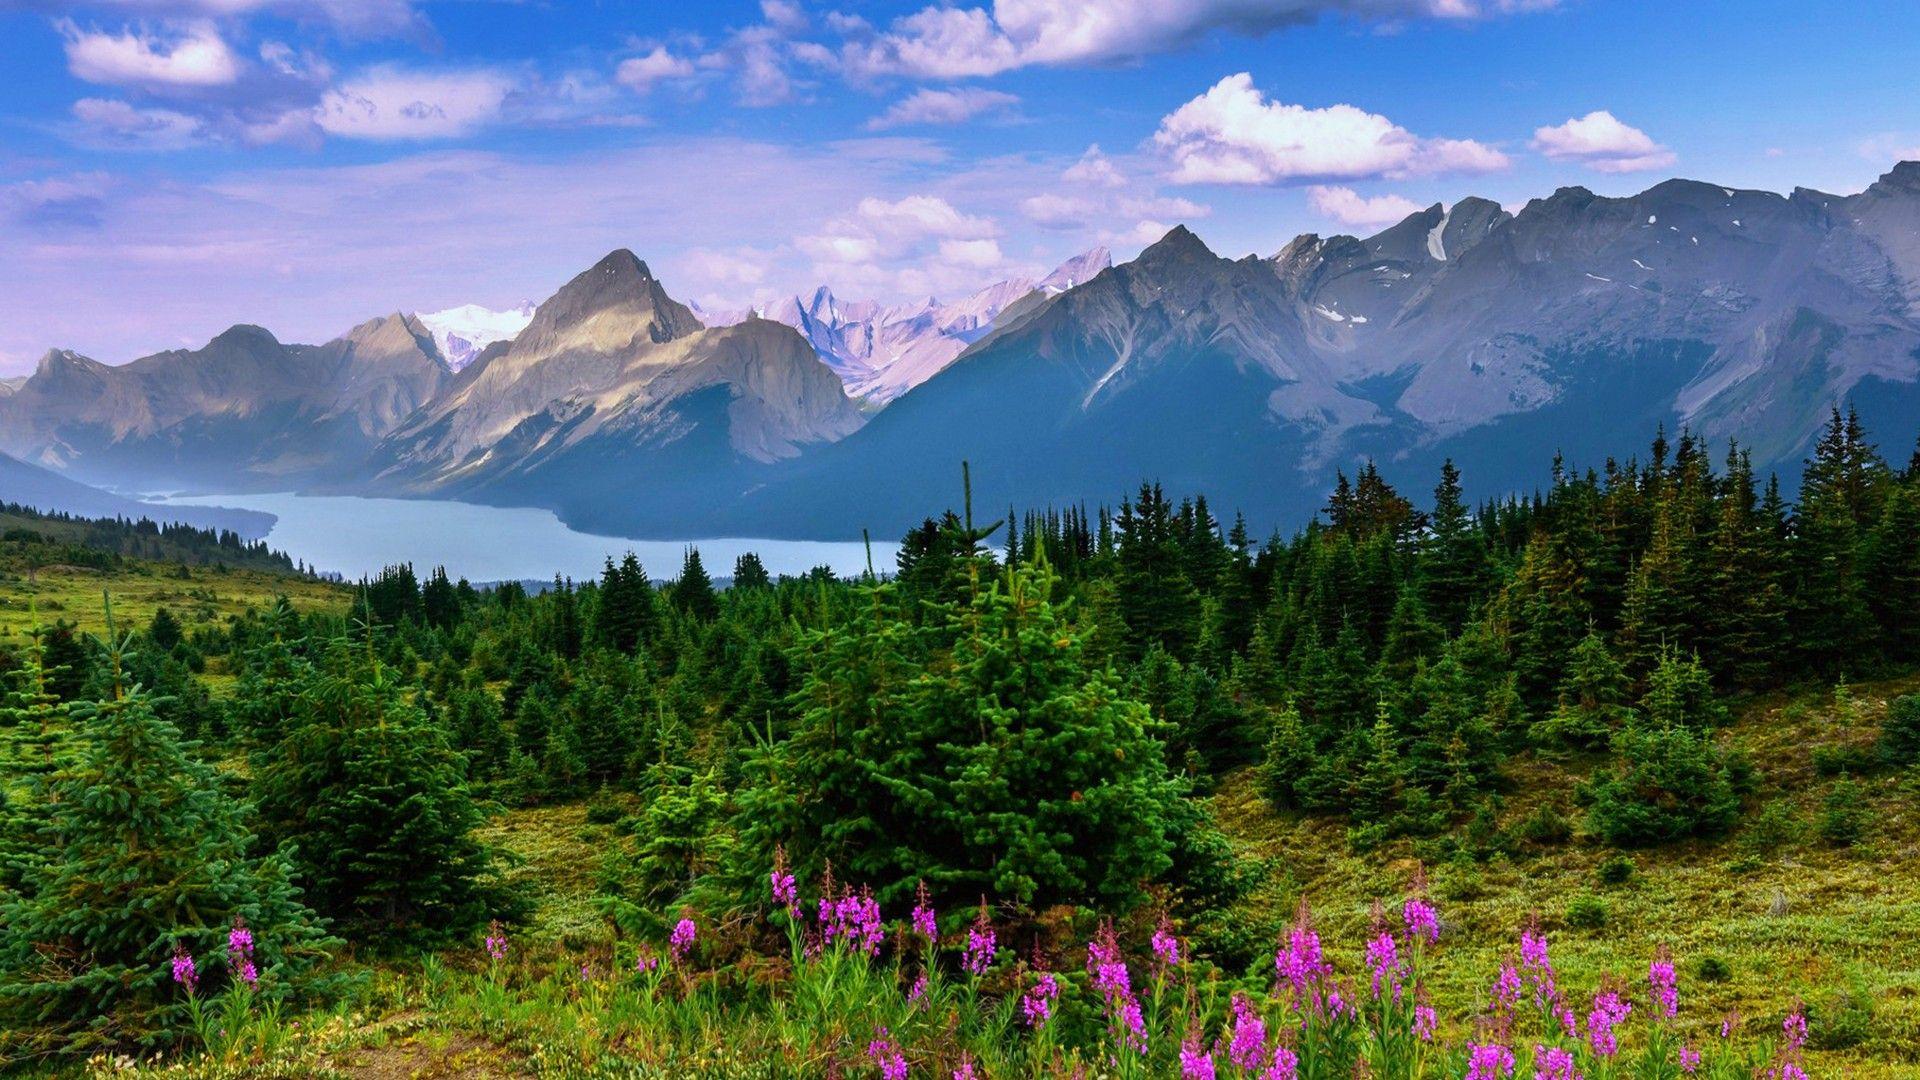 Beautiful Landscape Background Mountain Forest Trees Lake Flowers Schone Landschaften Landschaftsbau See